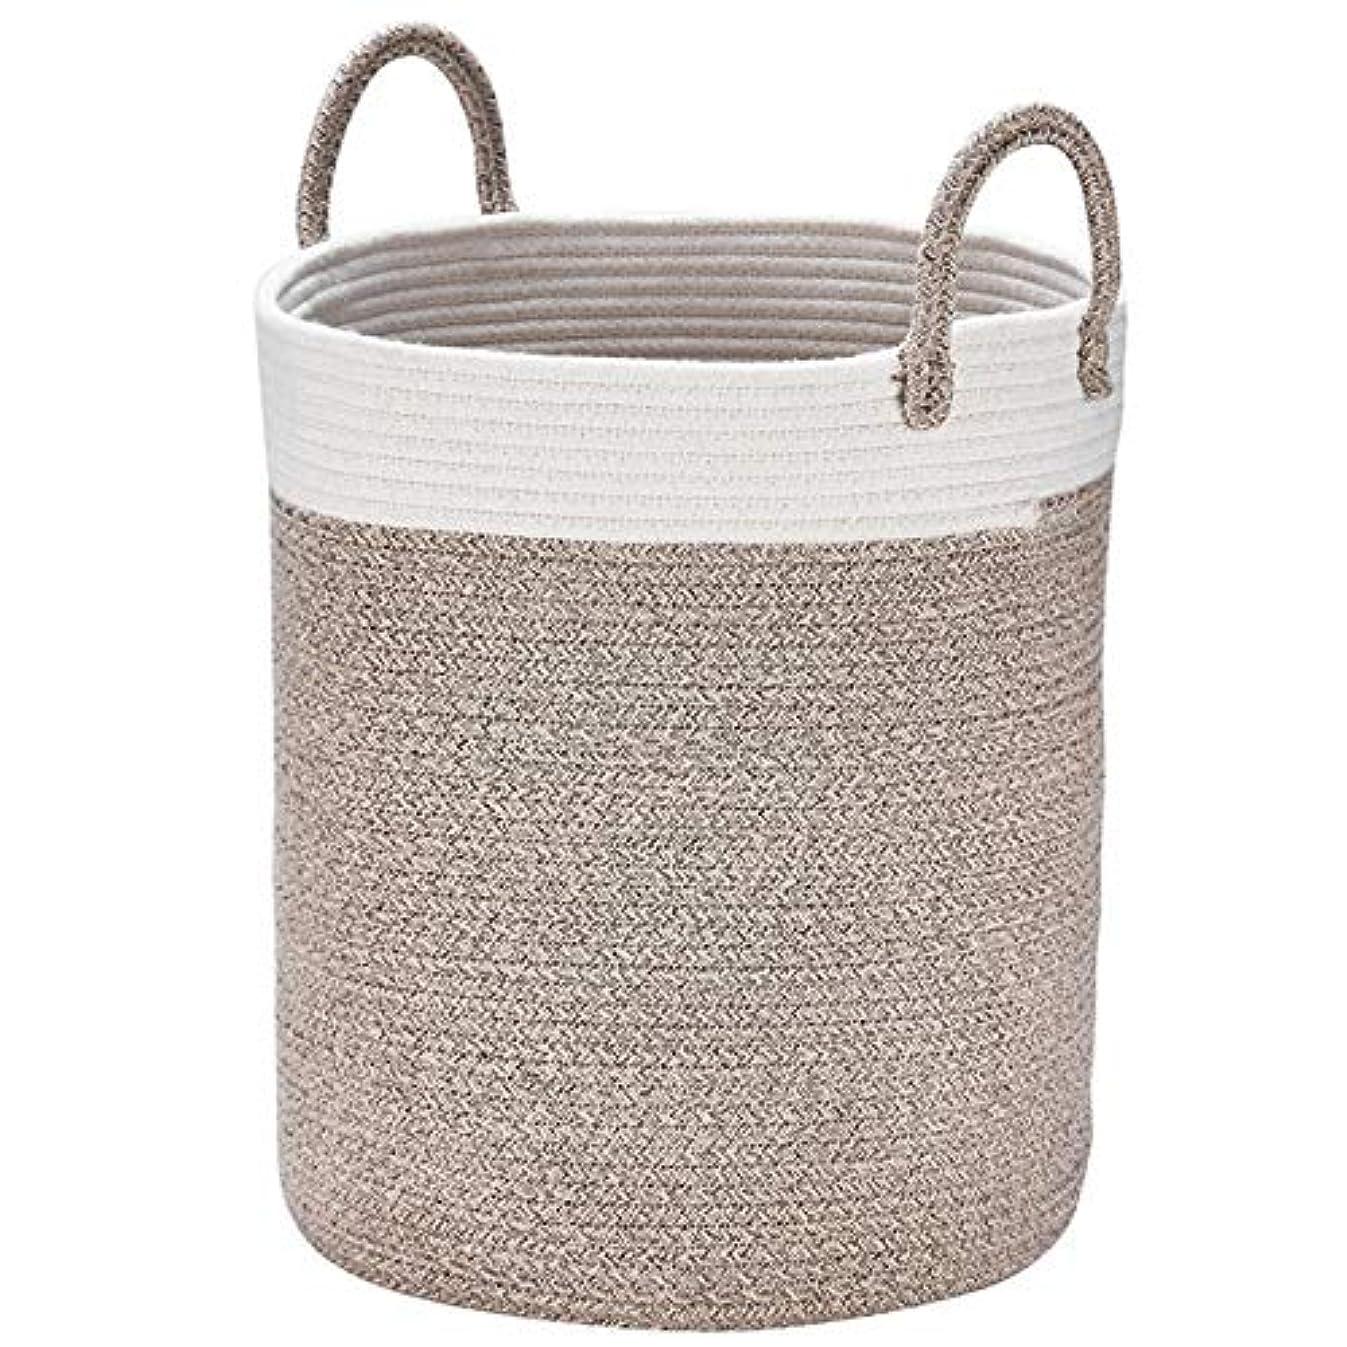 Woven Basket Rope Storage Baskets - Large Cotton Organizer 16